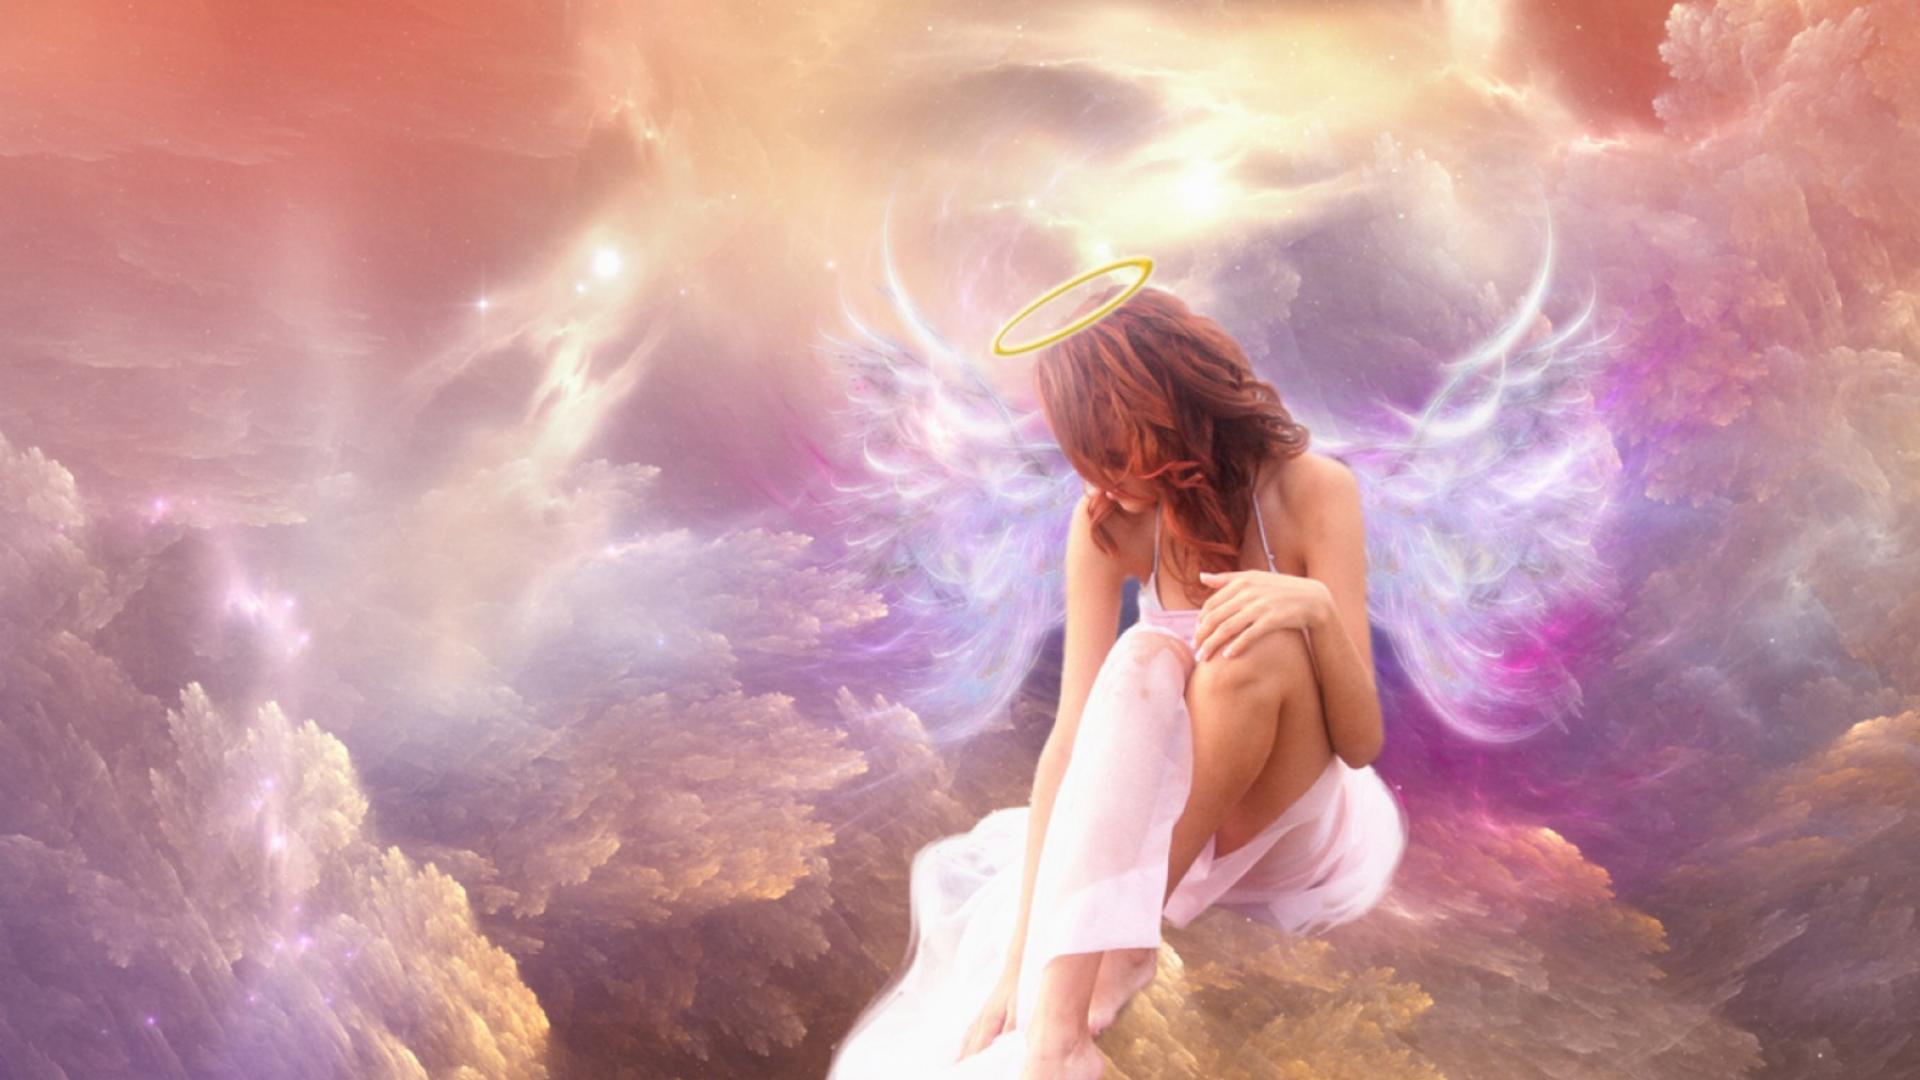 Fantasy Angel Wallpaper 19202151080 122257 HD Wallpaper Res 1920x1080